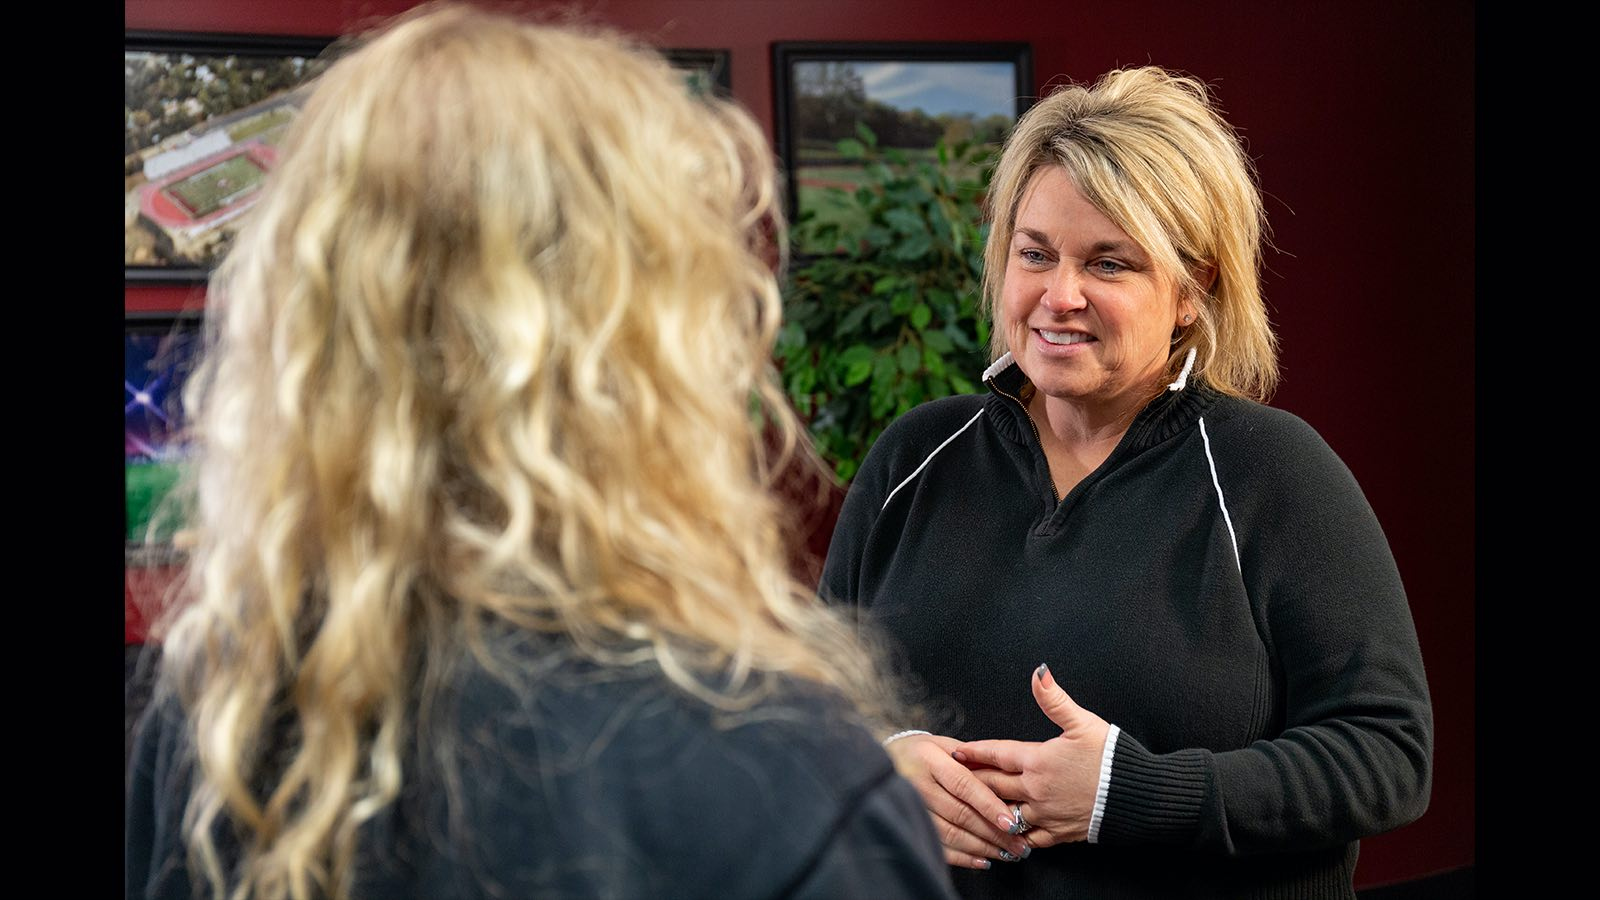 Morningside Coach Jessica Jones-Sitzmann talks with a student